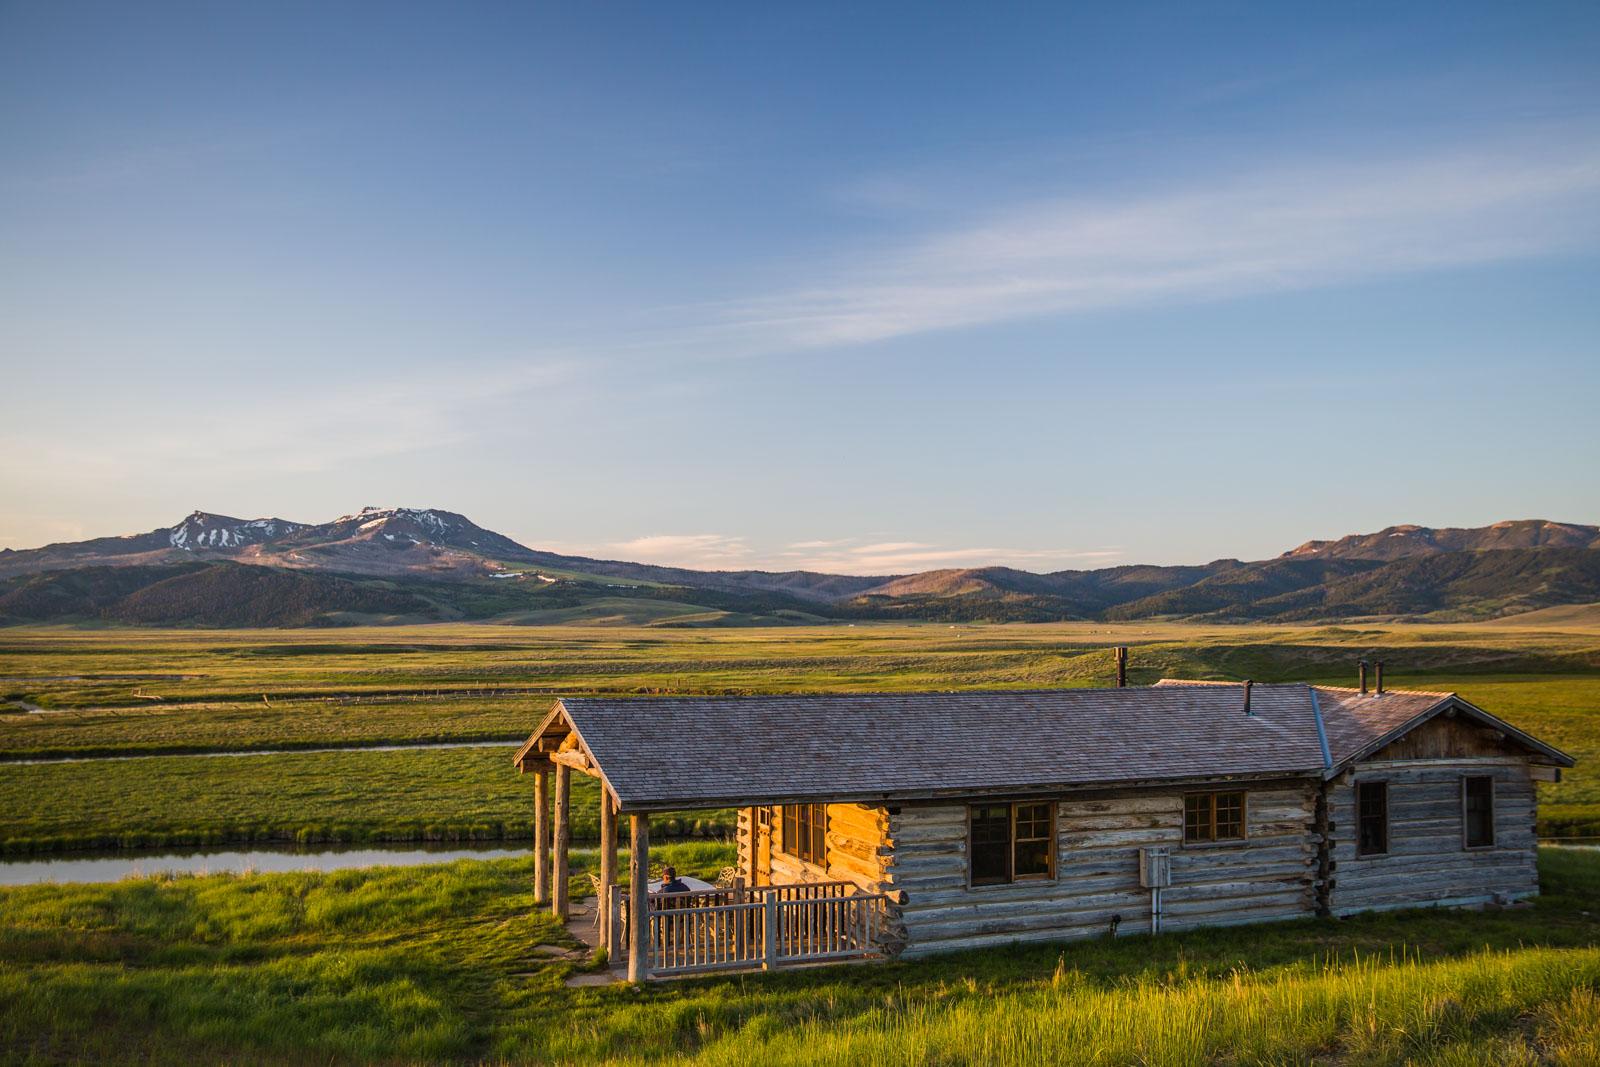 Ventyrsfotograf resefotograf f r j bar l ranch for Montana ranch house